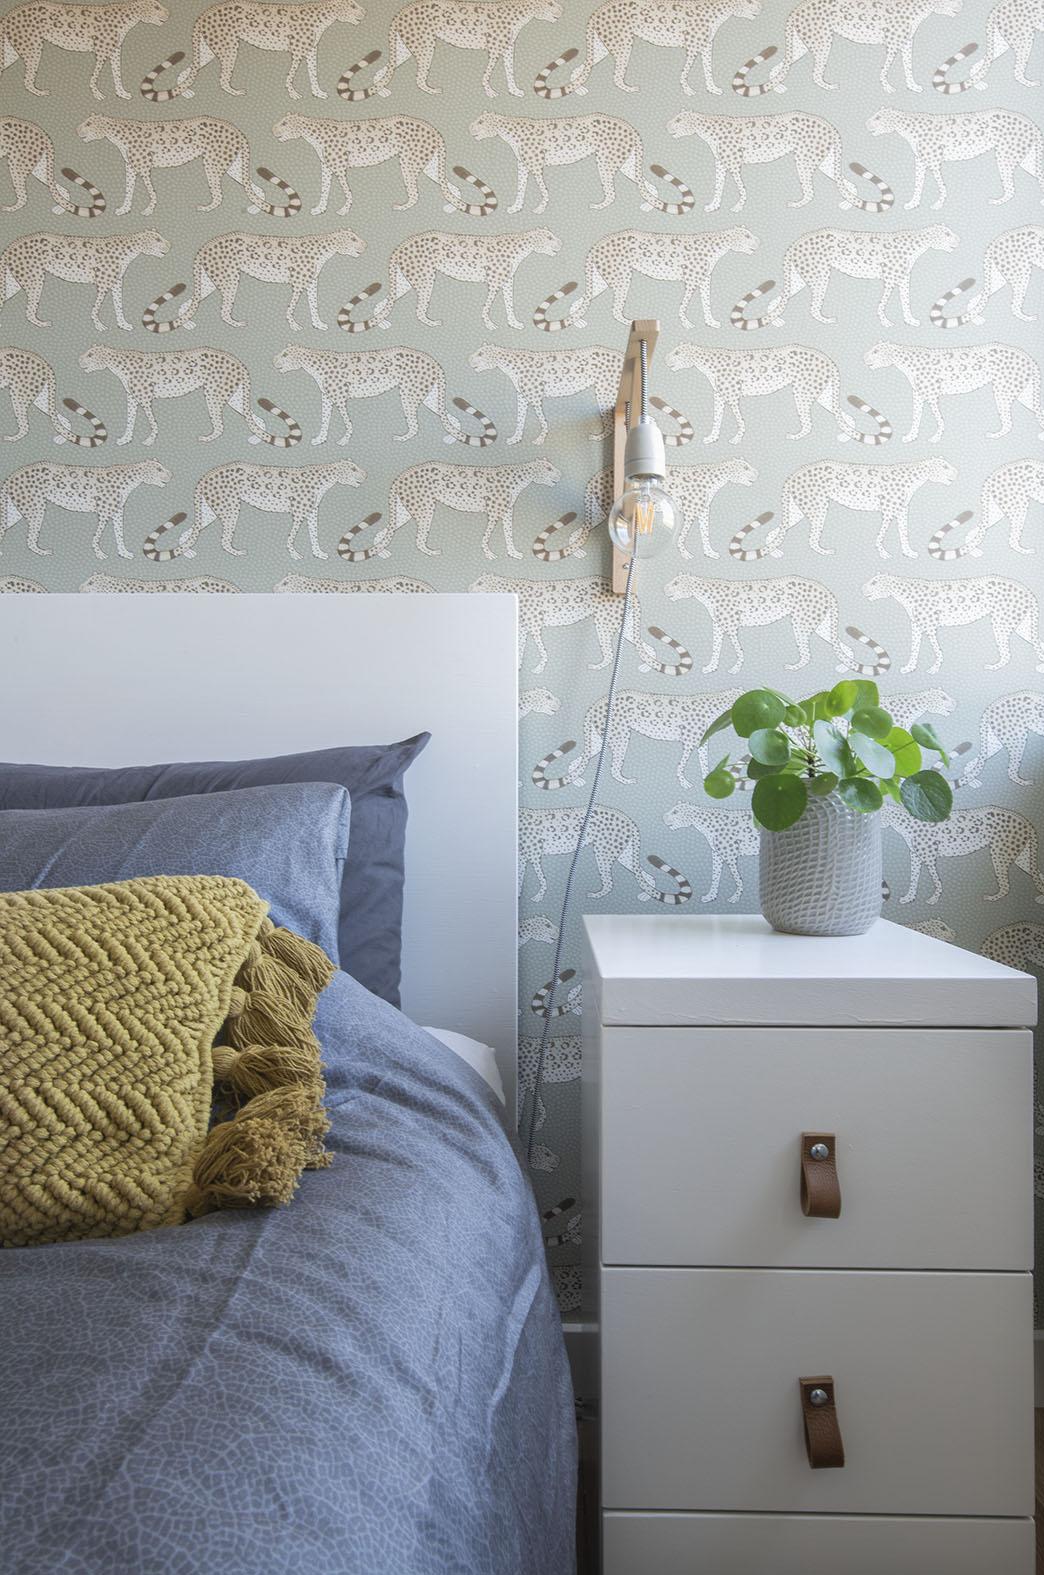 Slaapkamer-interieur-ontwerp-blauw-luipaard-styling-groen-8